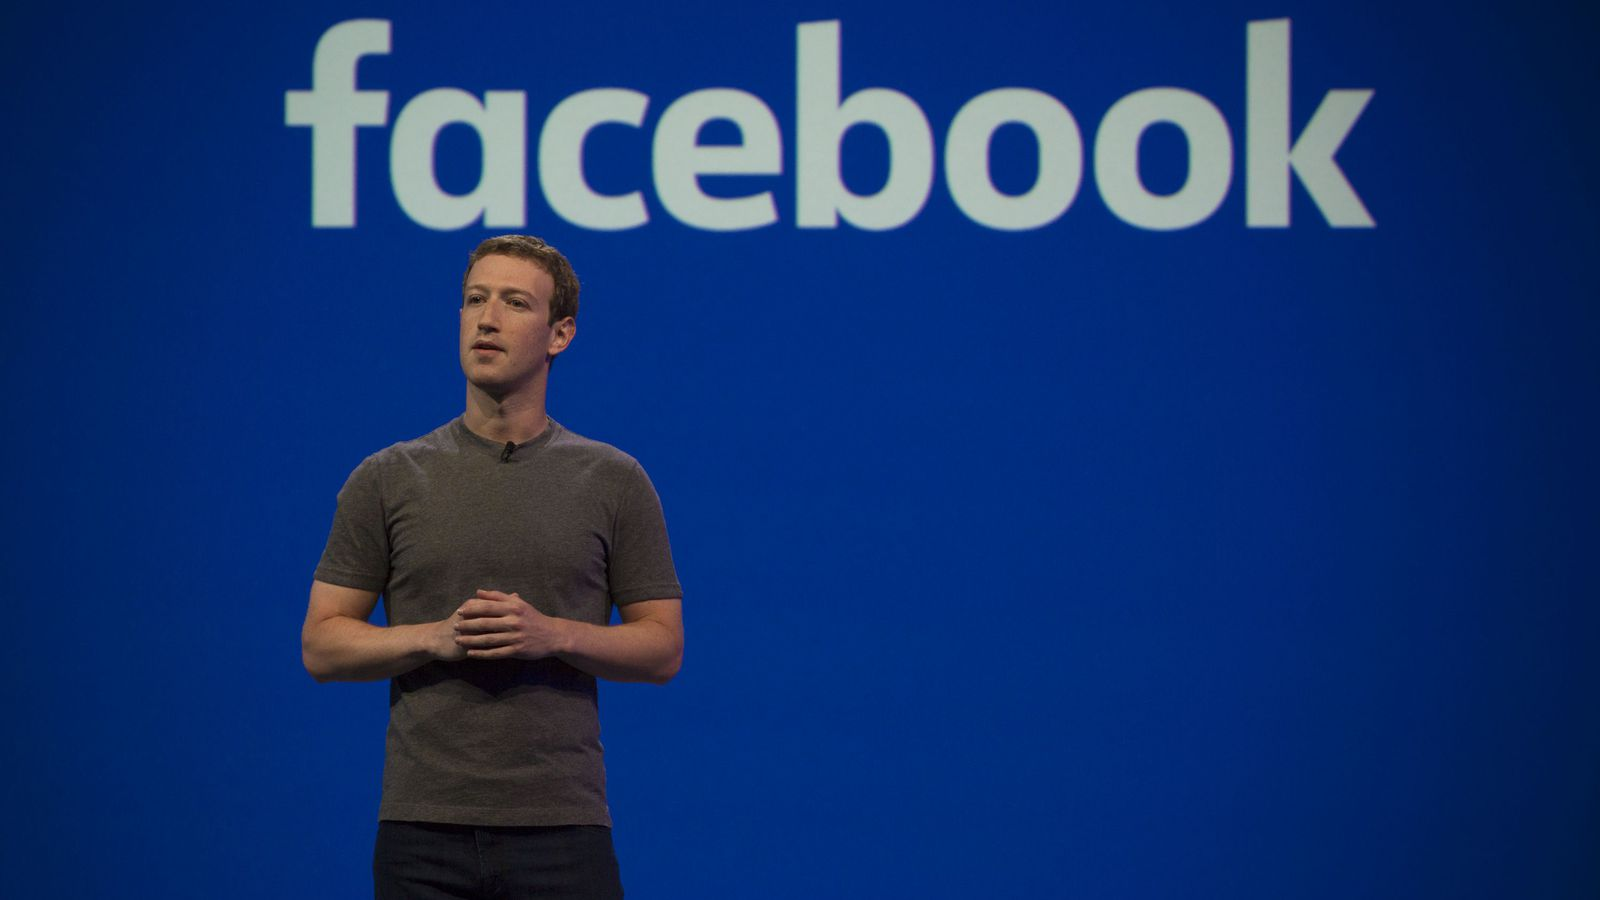 How Mark Zuckerberg lost $17 billion in just 2 hours